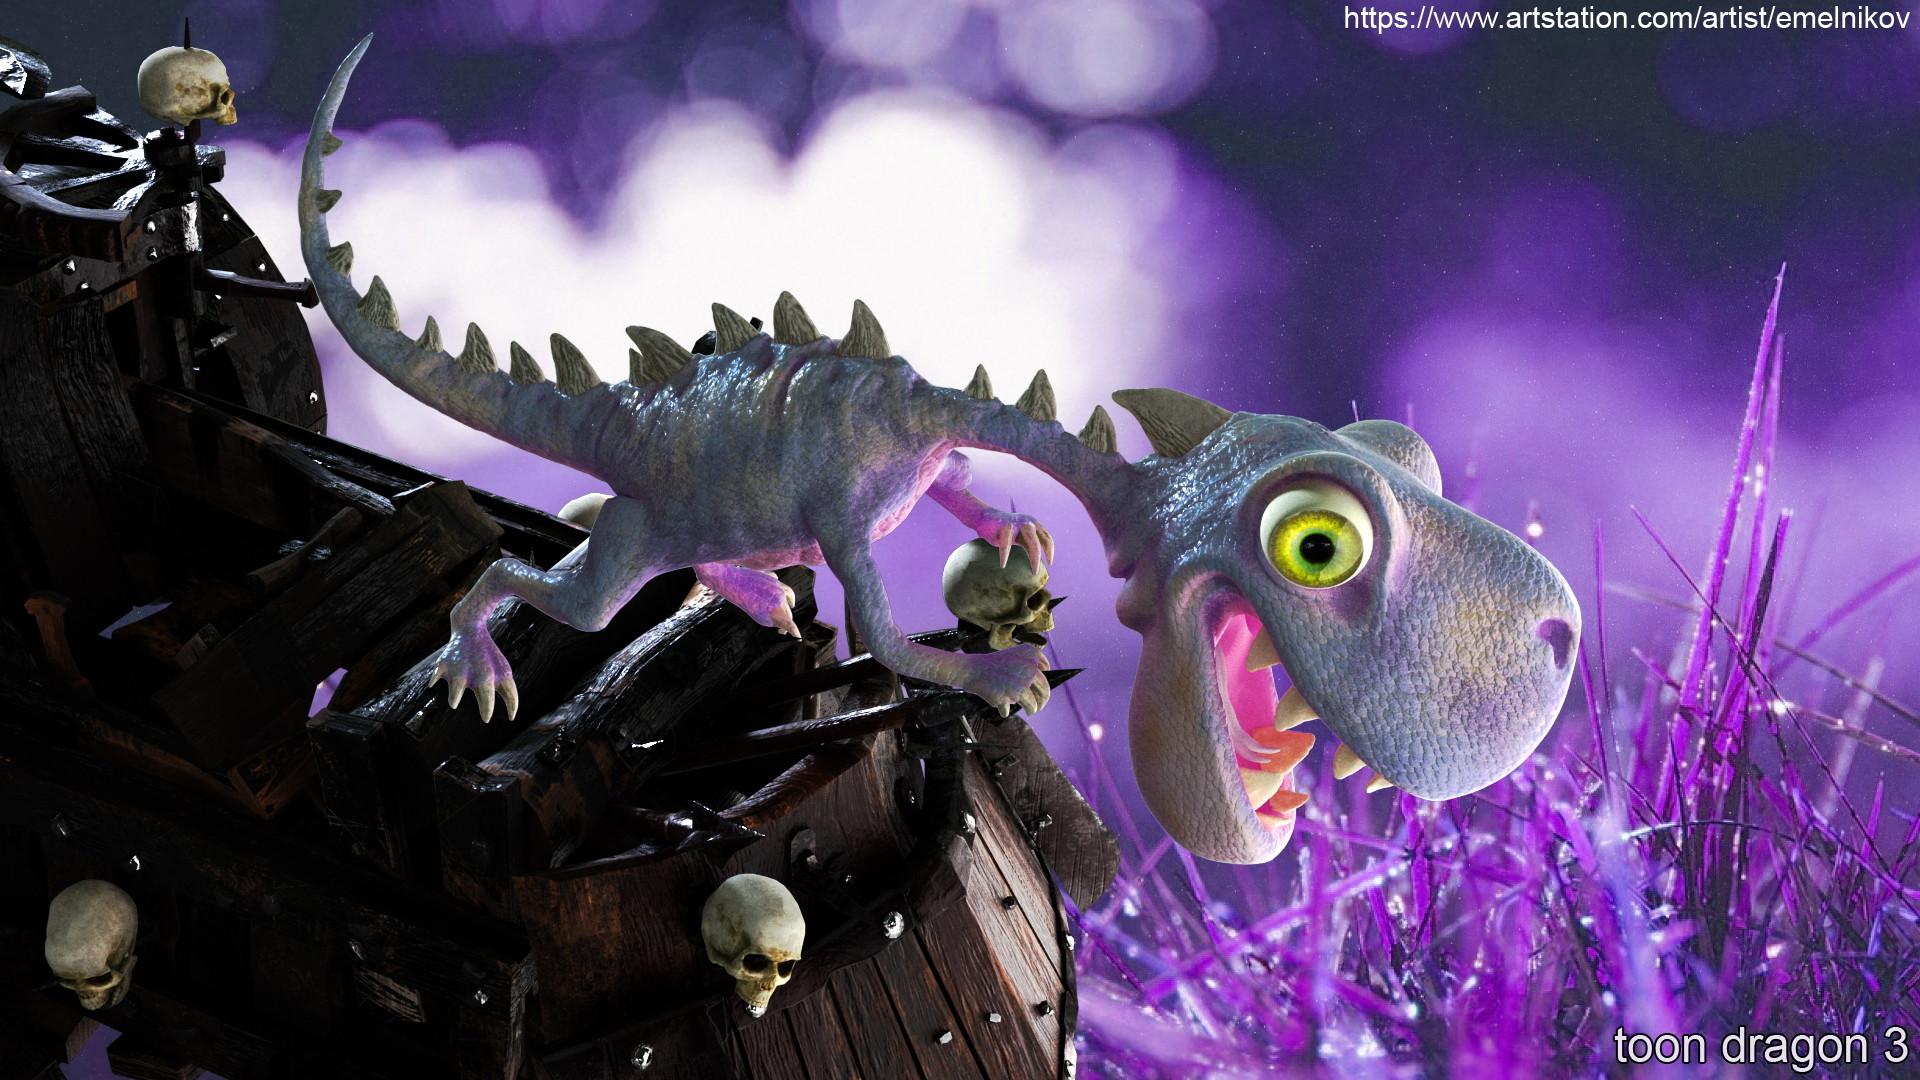 Eugene melnikov toon dragon 3 4 c